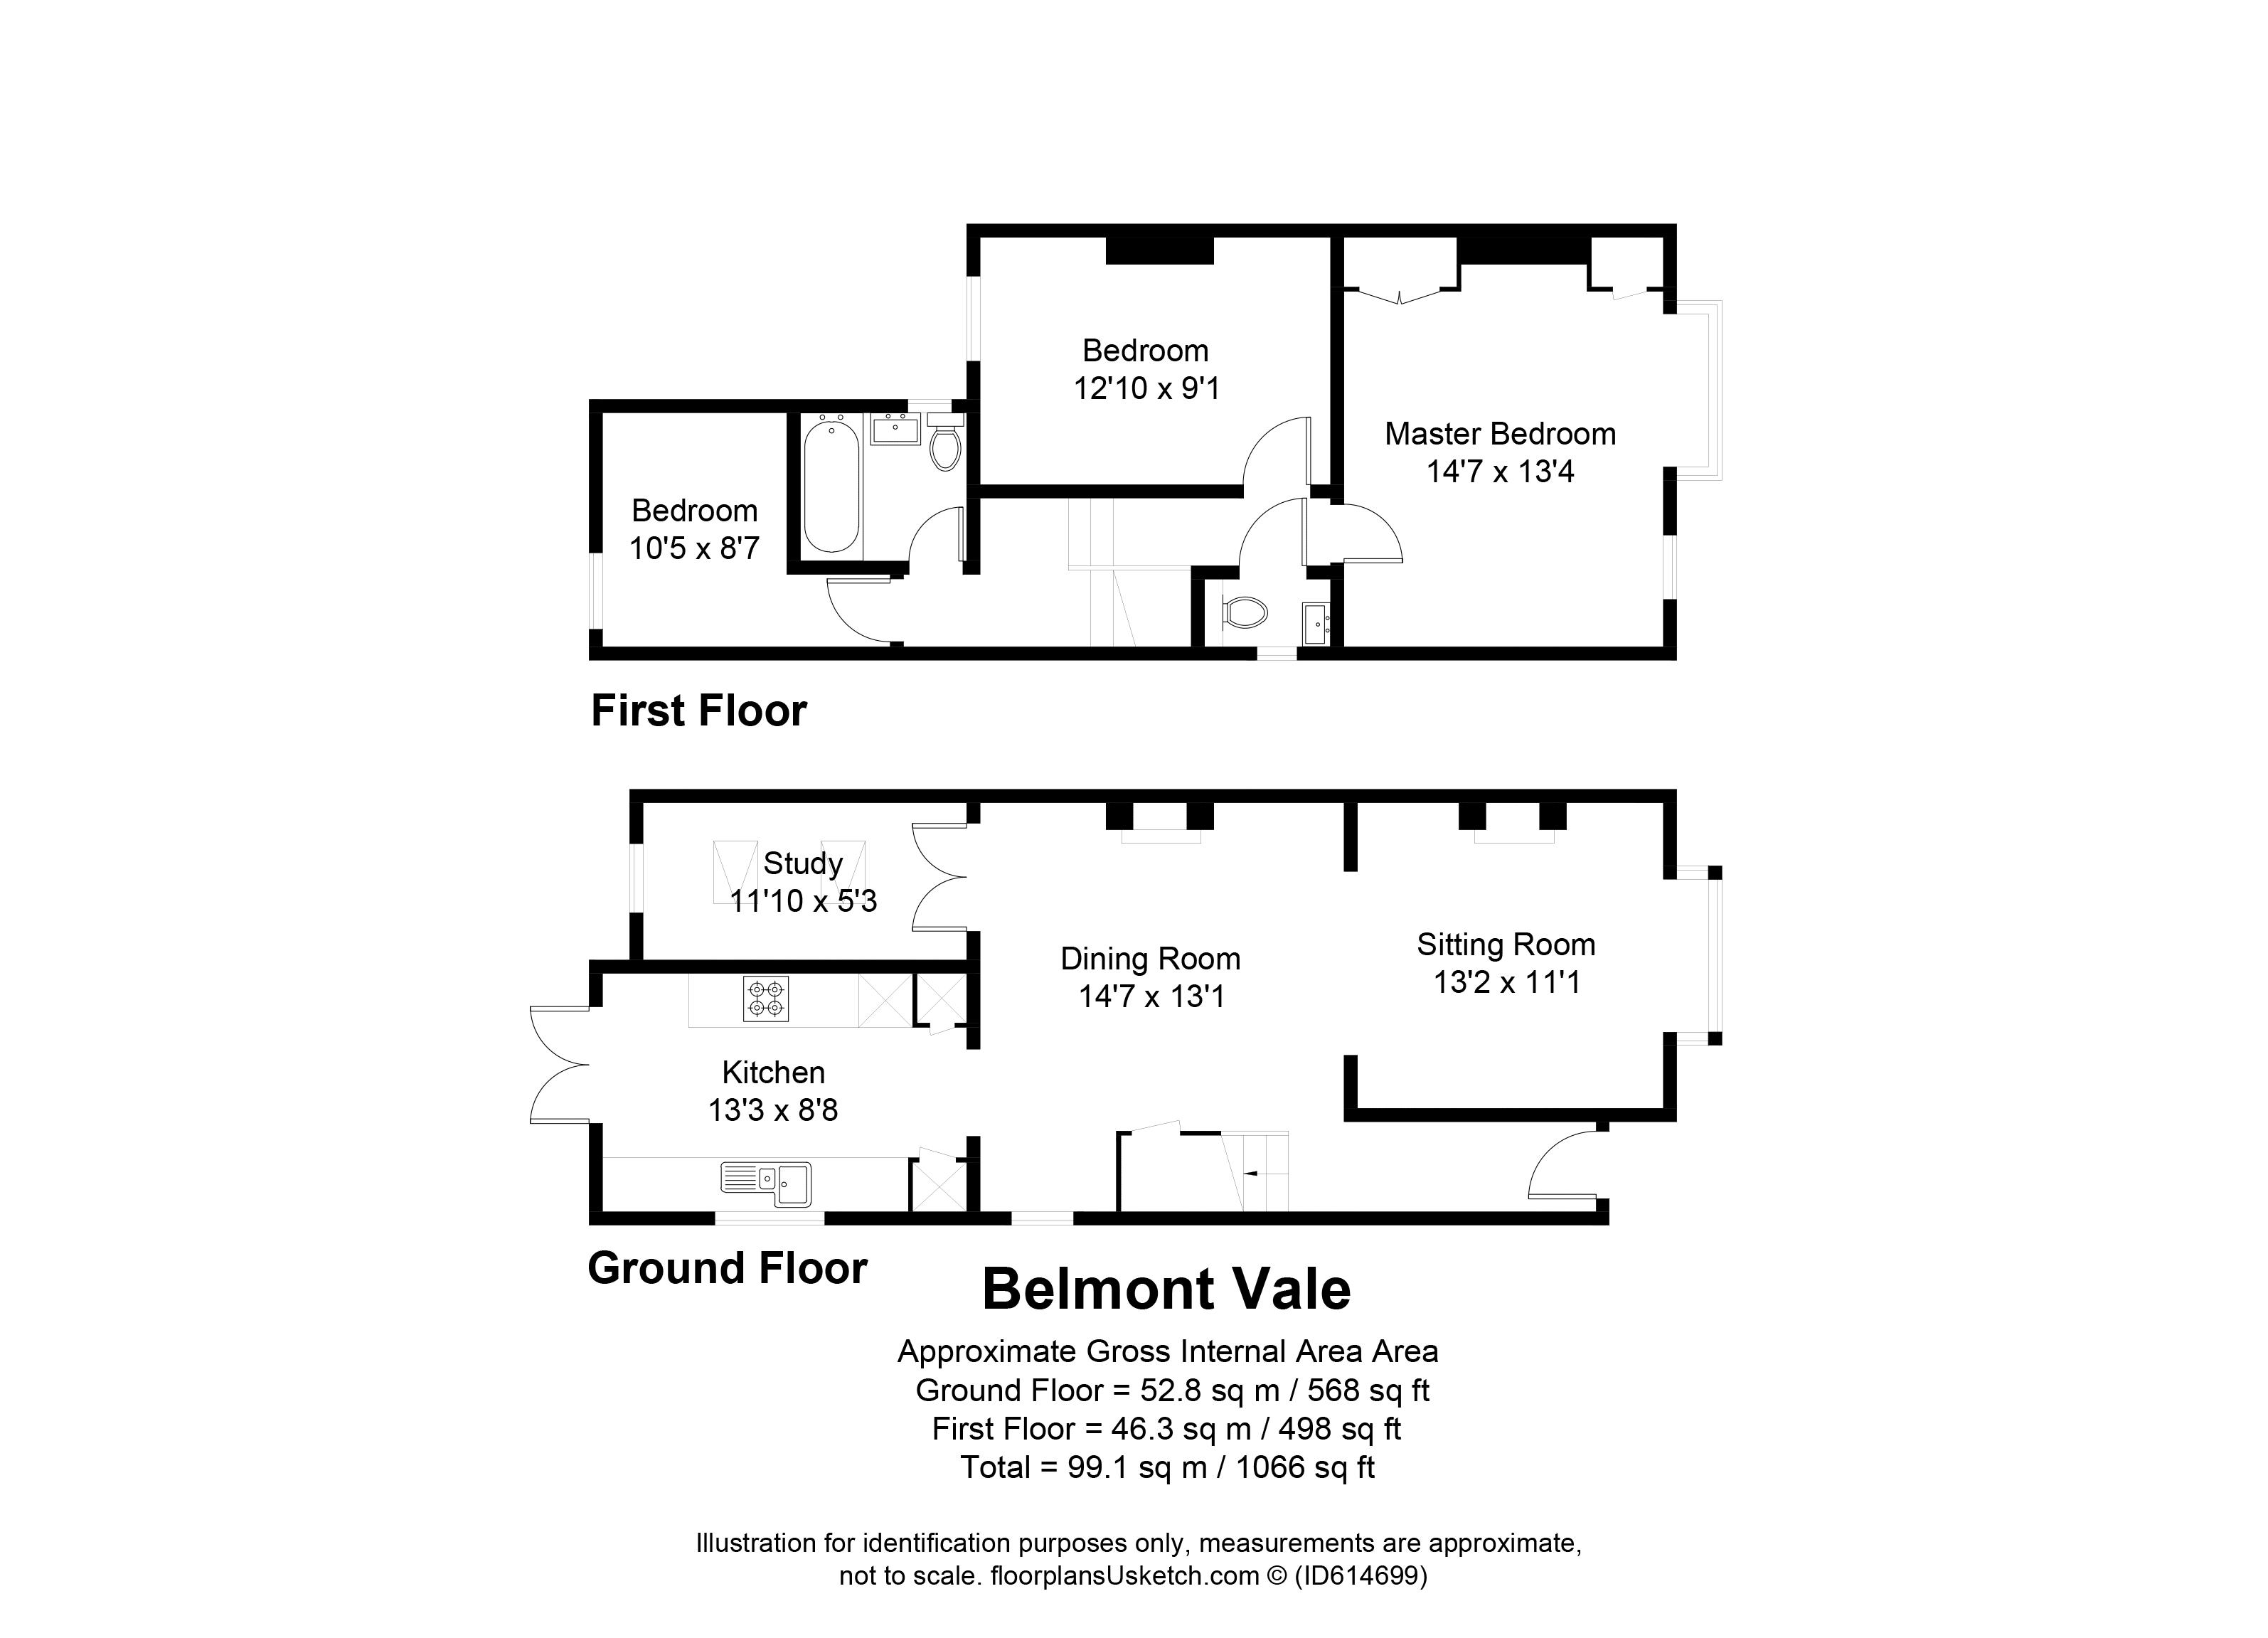 Belmont Vale